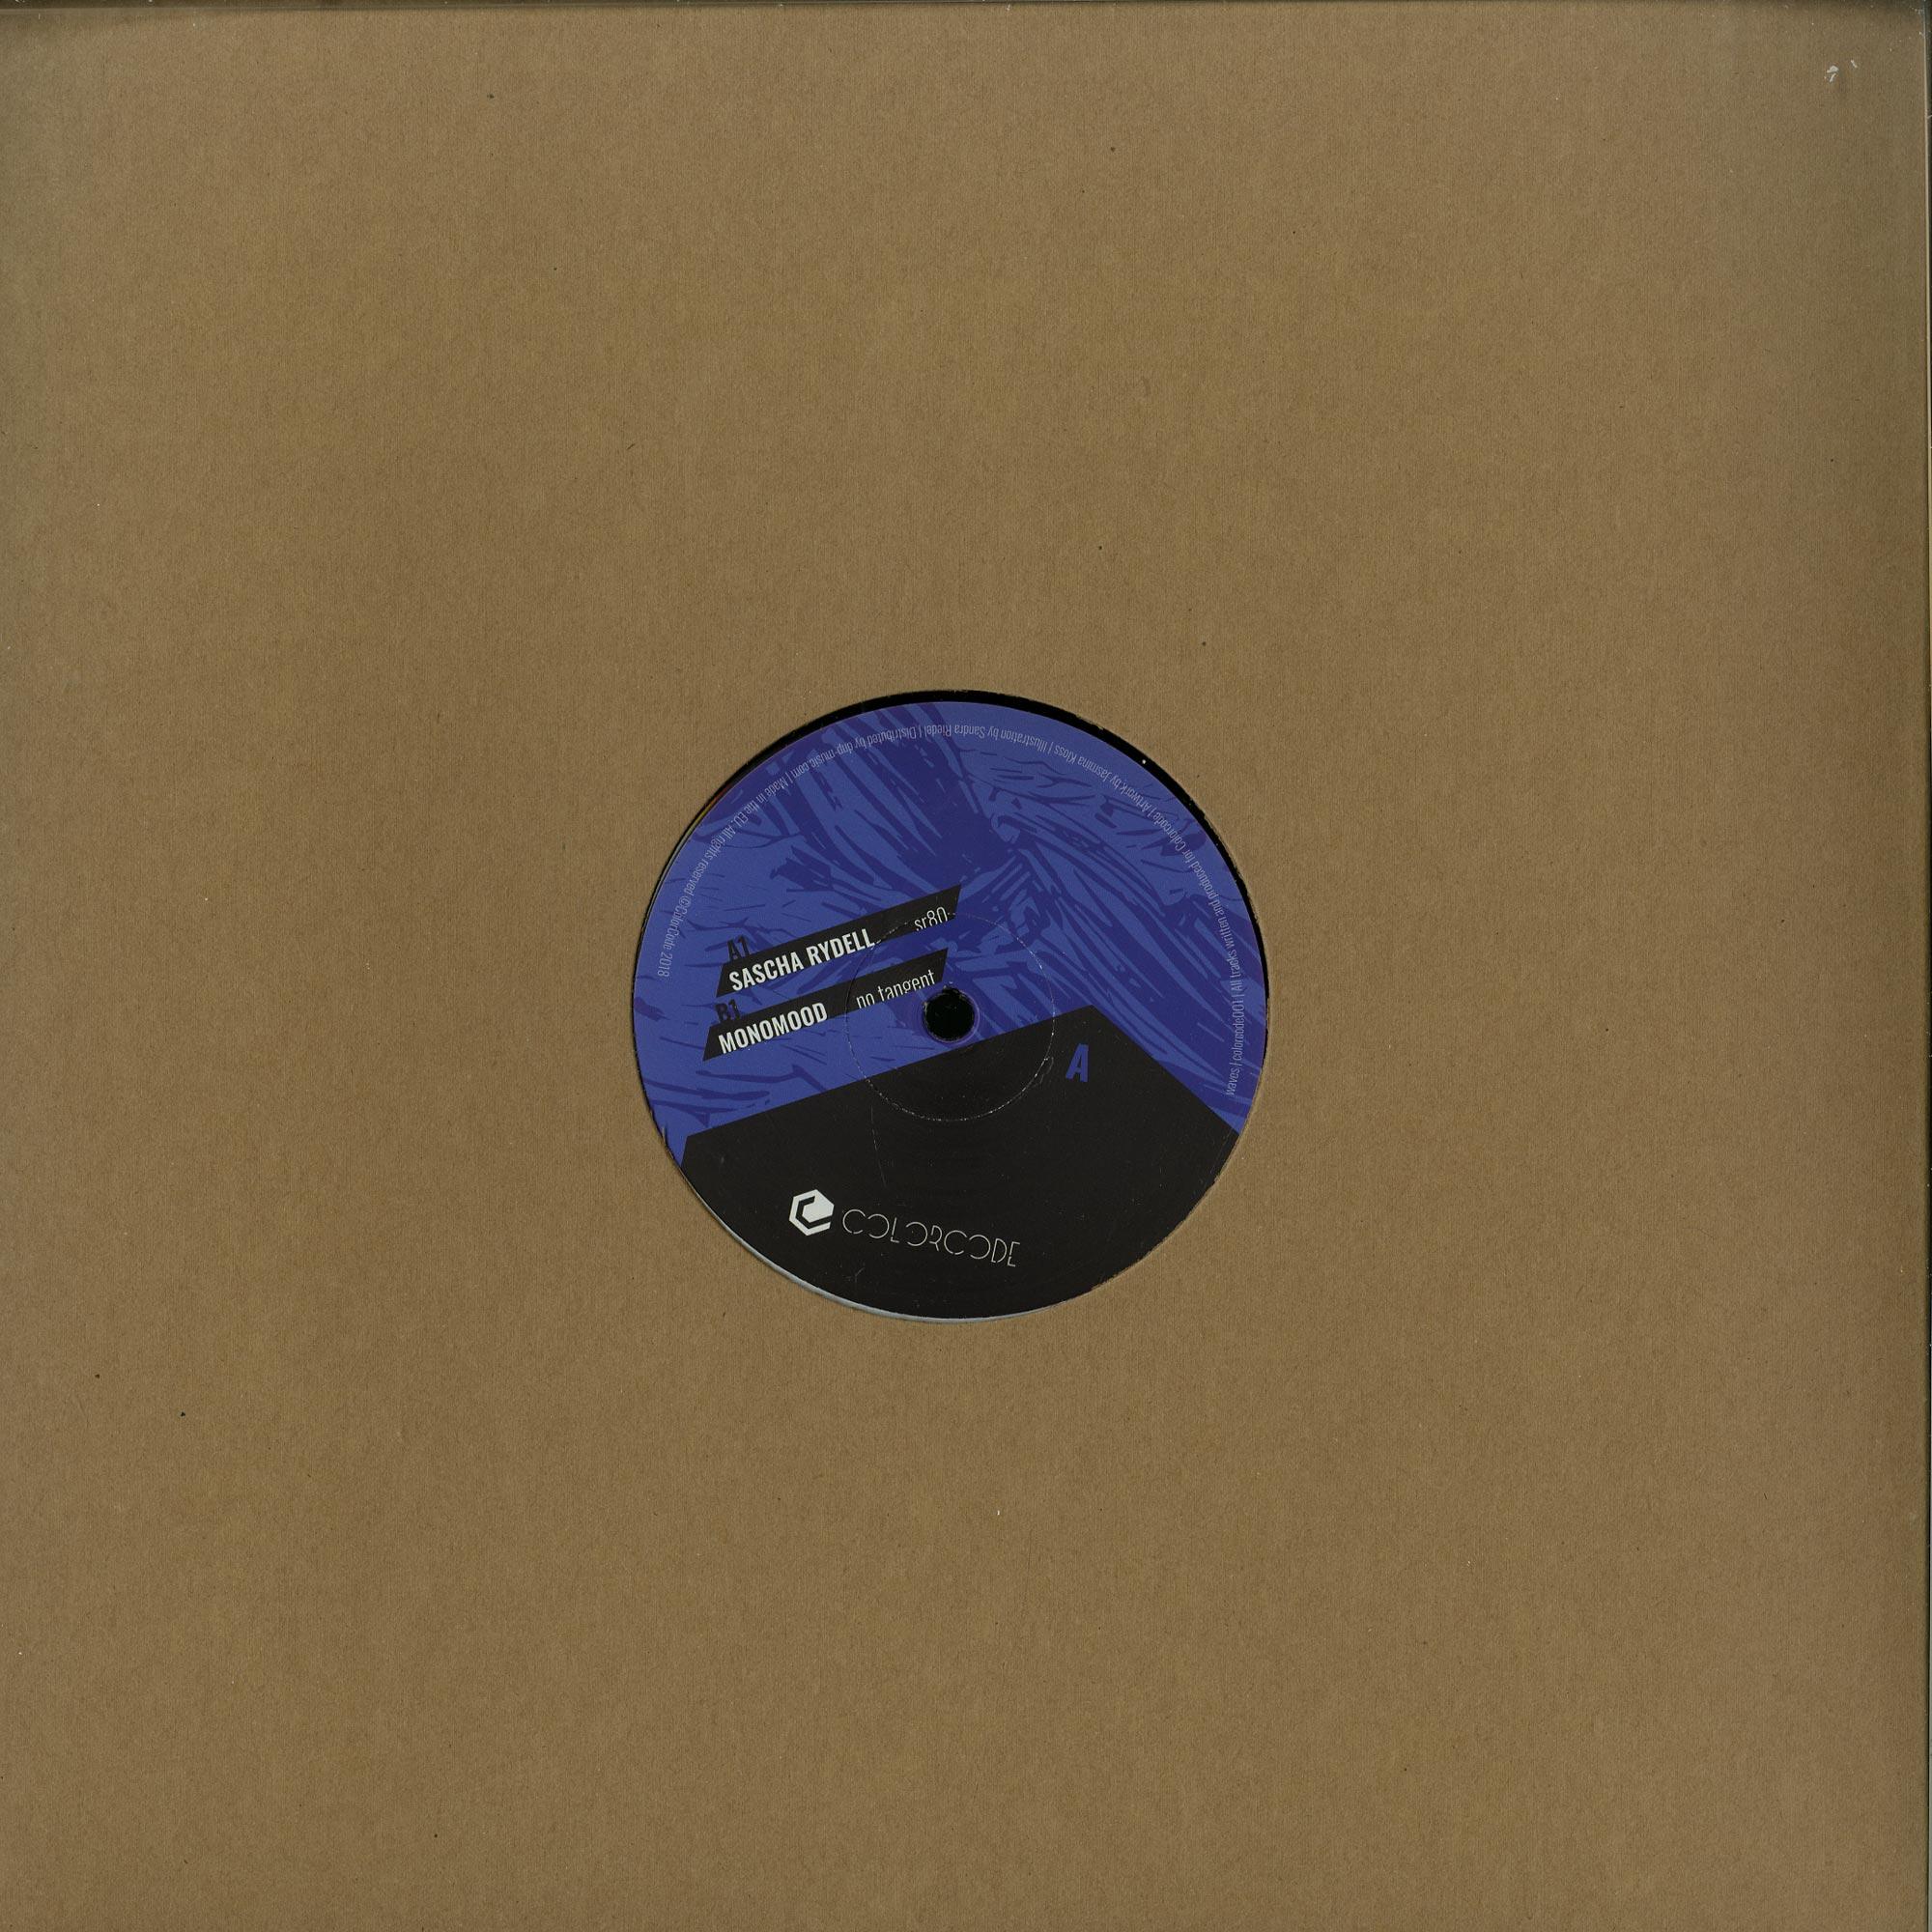 Sascha Rydell / Monomood - WAVES